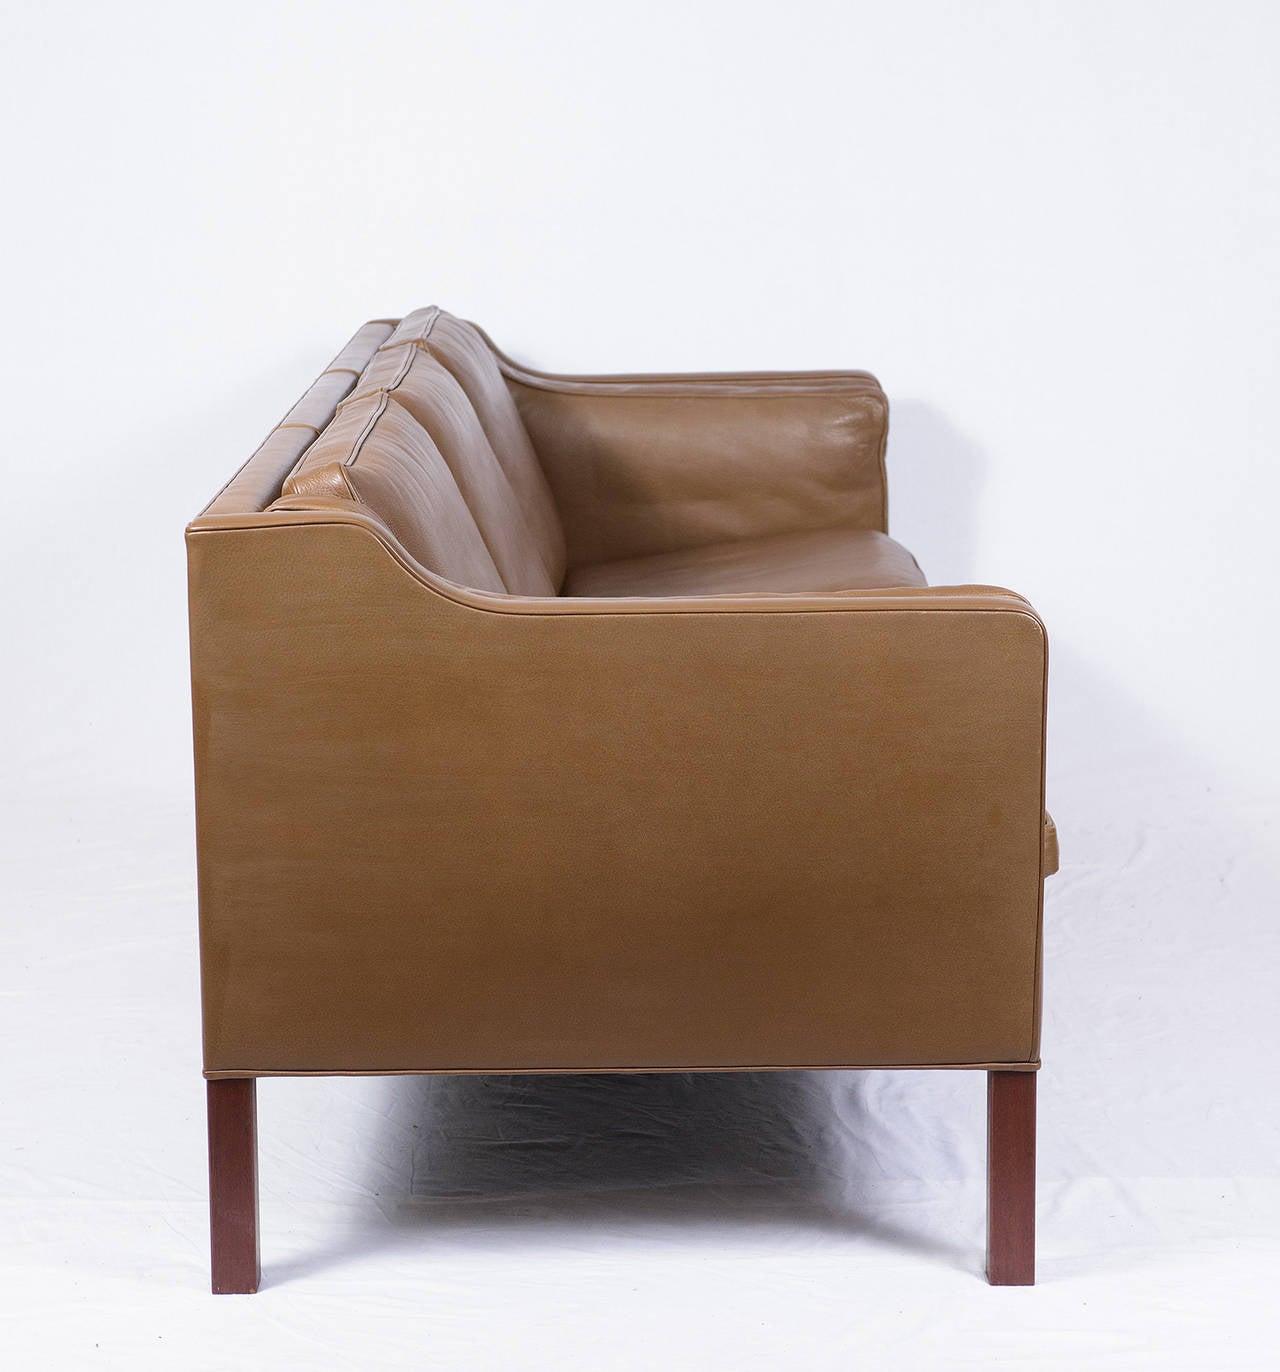 borge mogensen sofa model 2209 broyhill sleeper reviews 2213 three seat leather at 1stdibs